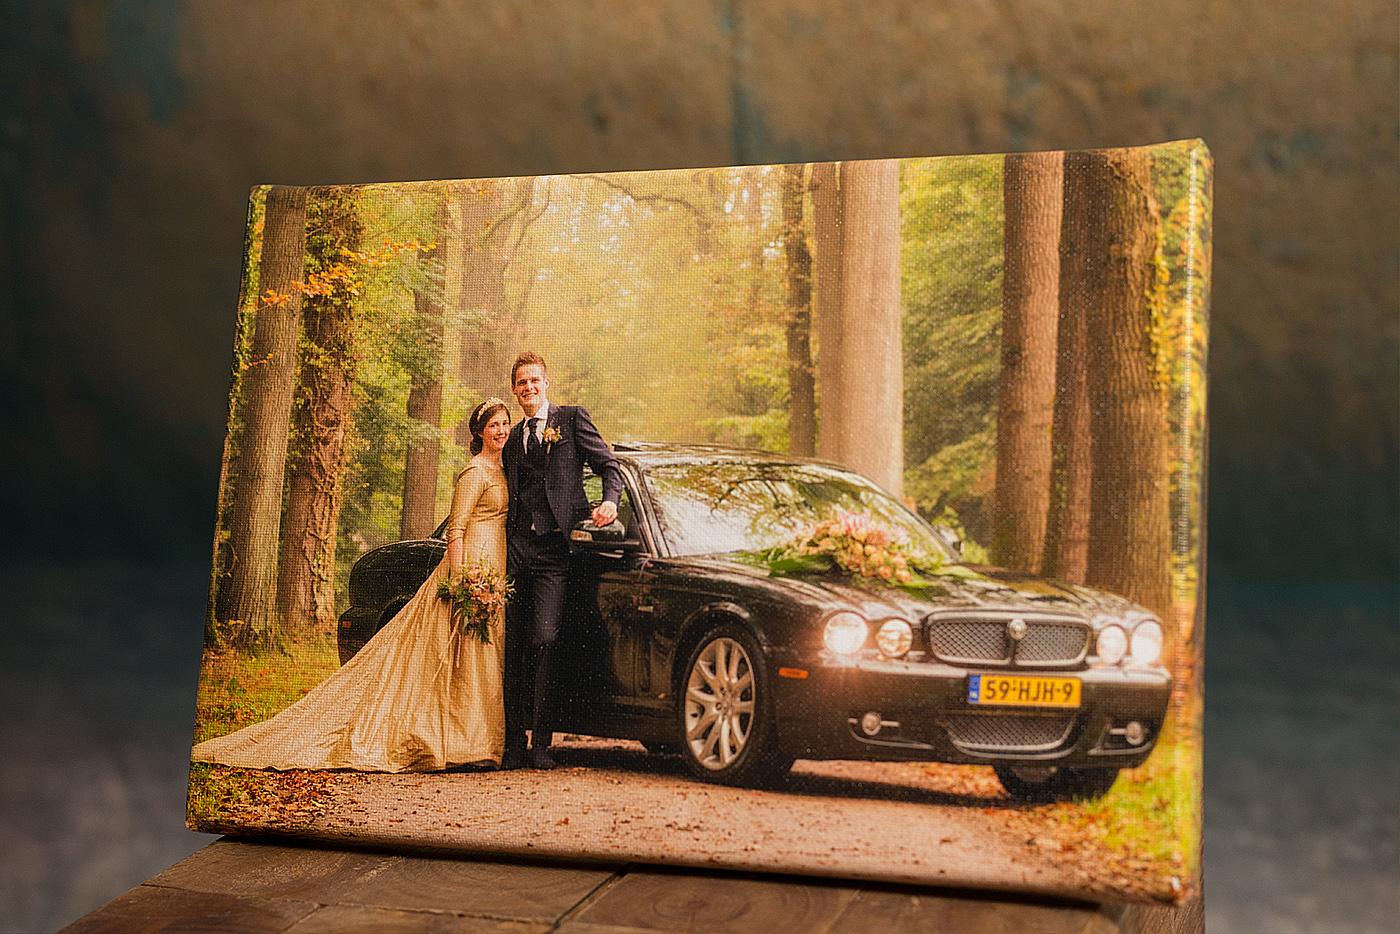 foto op canvas Uddel Wouter van Middendorp fotografie canvas-26